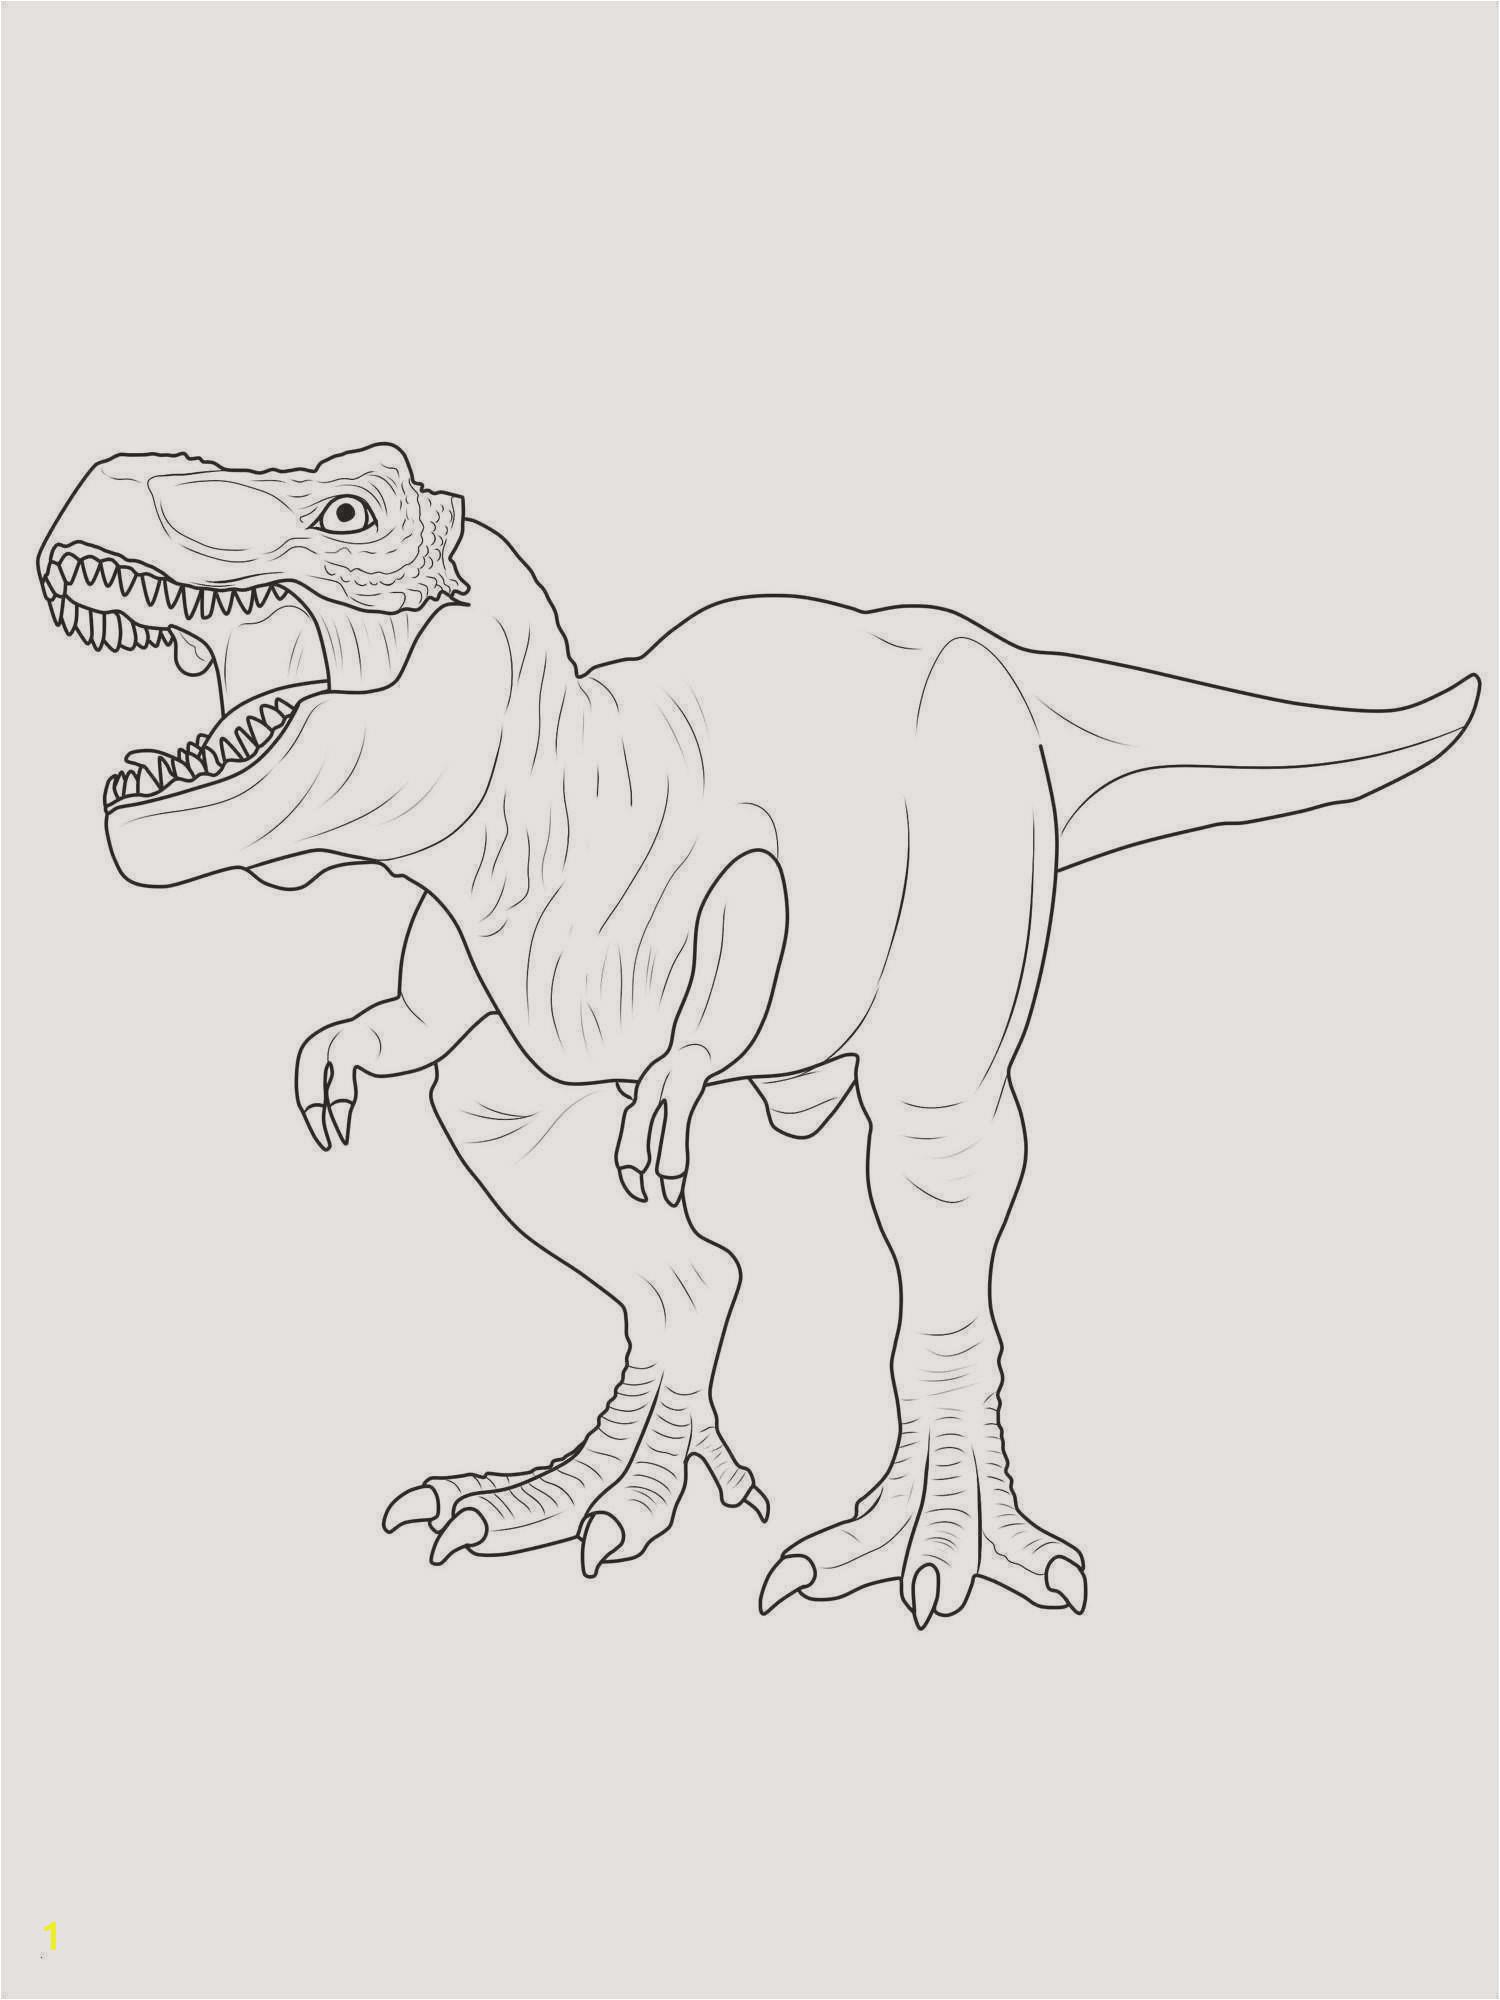 ausmalbilder jurassic park 30 neu tyrannosaurus rex ausmalbilder ausdrucken of ausmalbilder jurassic park